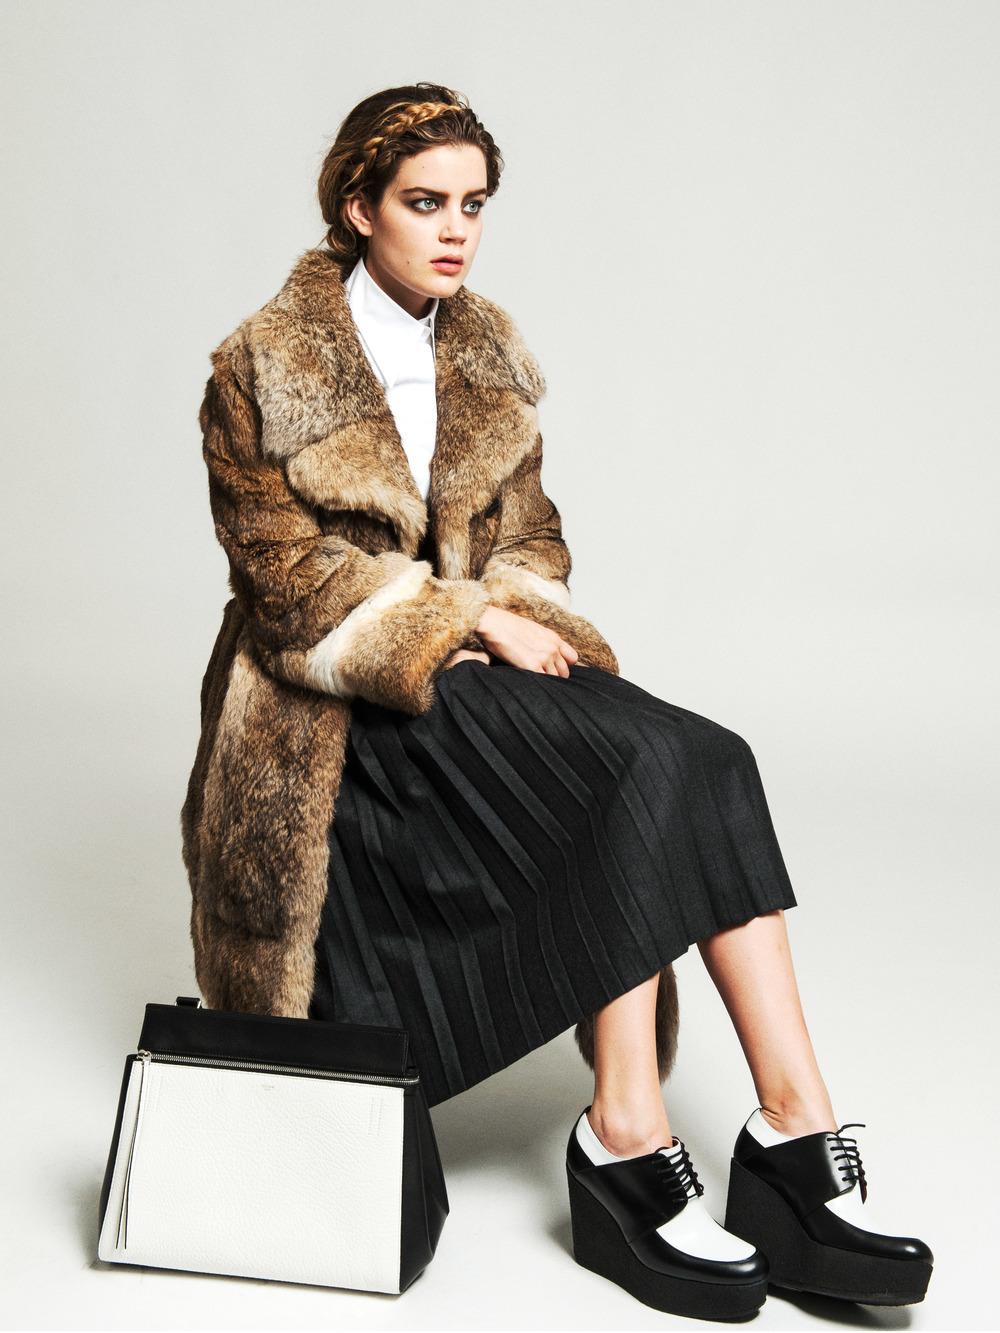 Fashion_by_LeandroJusten_004.jpg